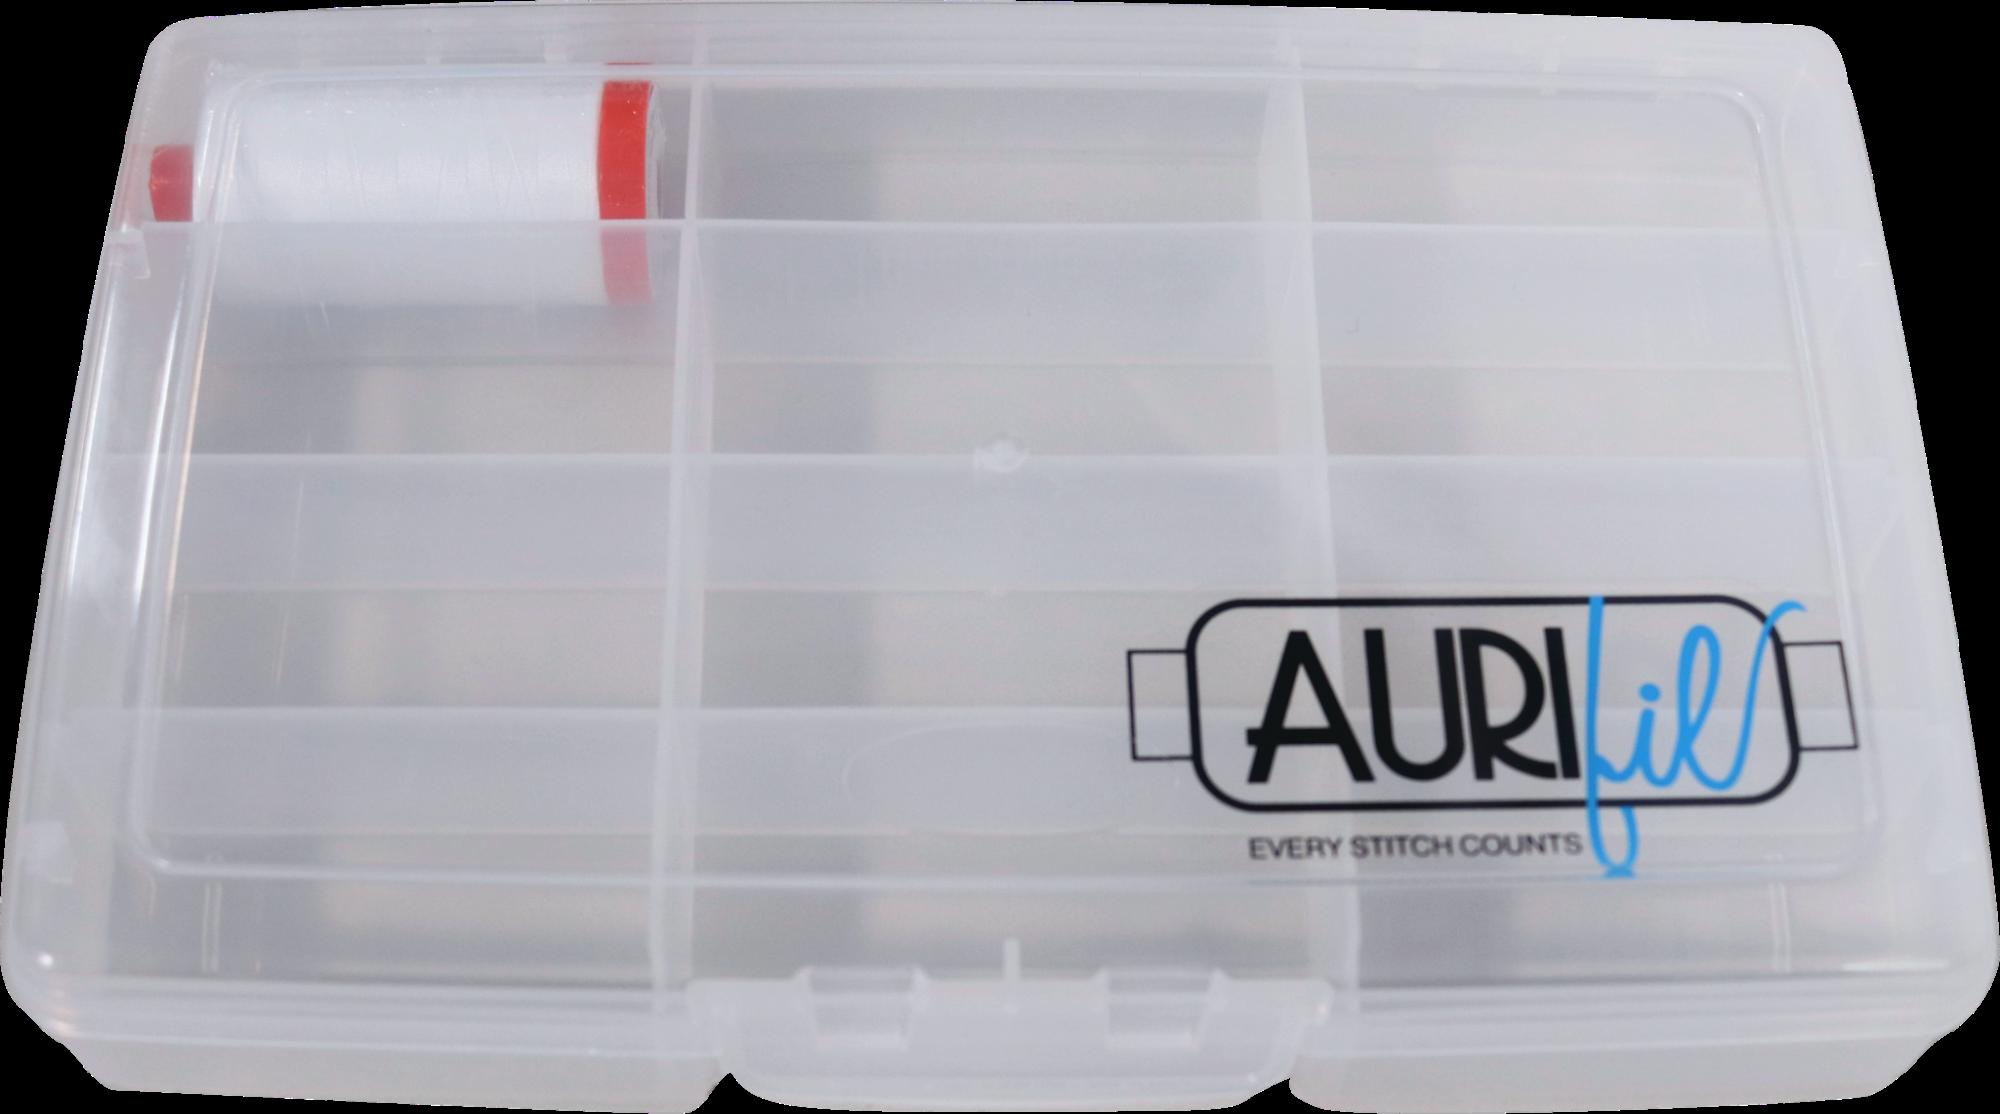 Aurifil Storage Box & Spool of White Thread